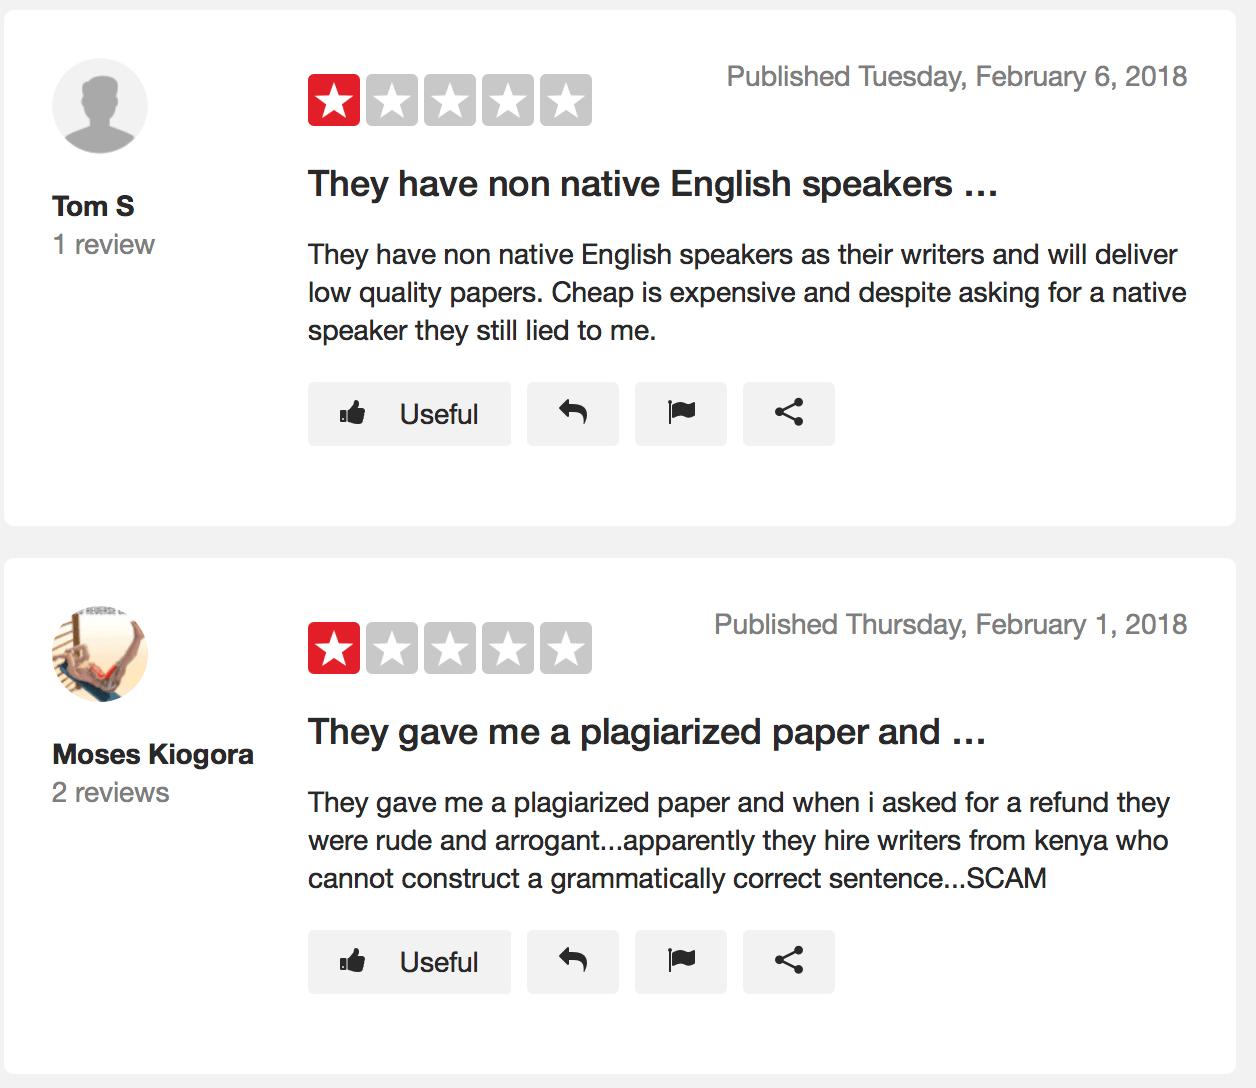 Trustpilot essaypro review 2